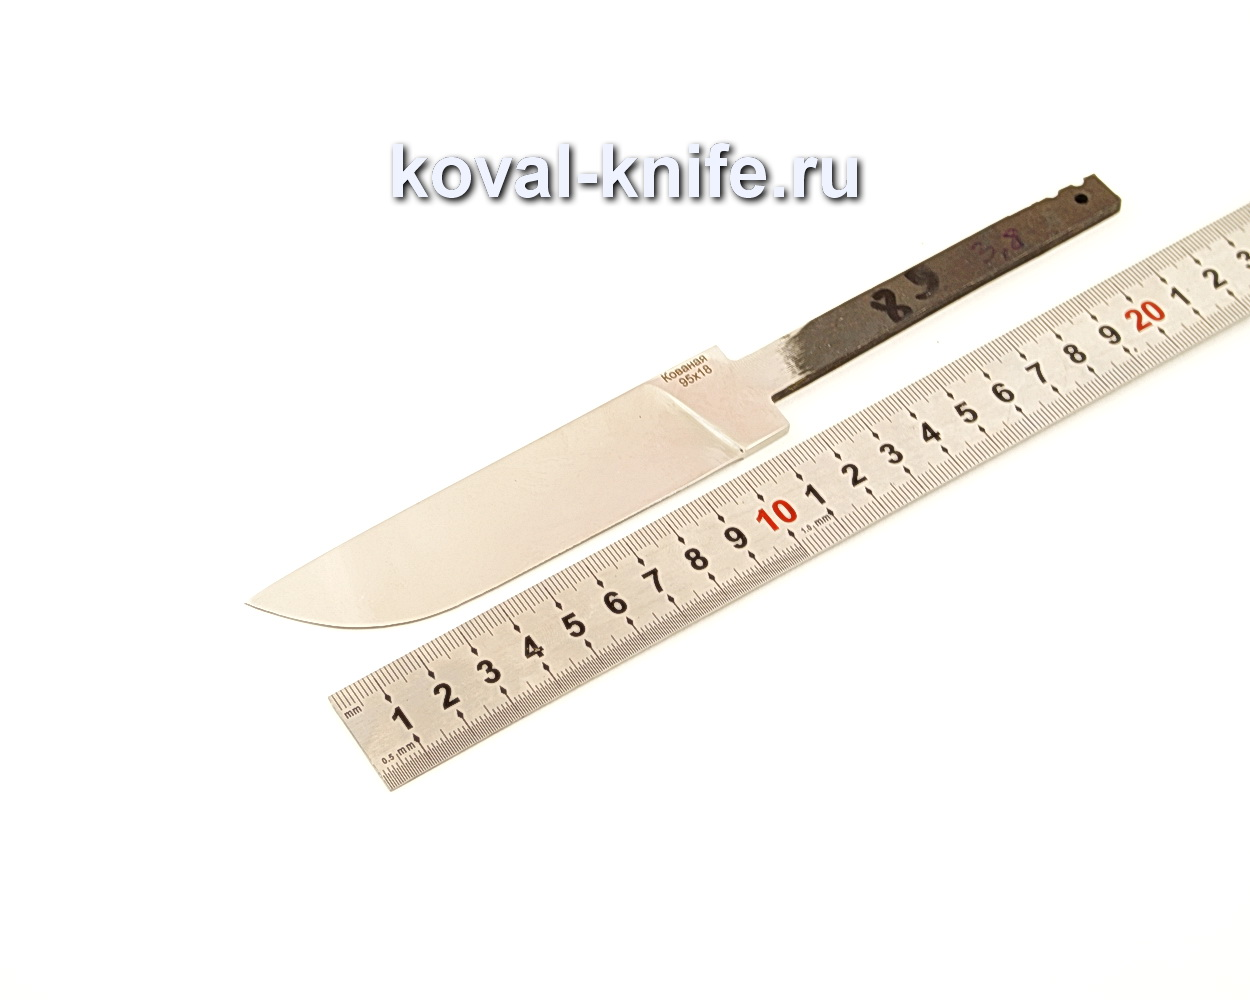 Клинок для ножа из кованой 95Х18 N89